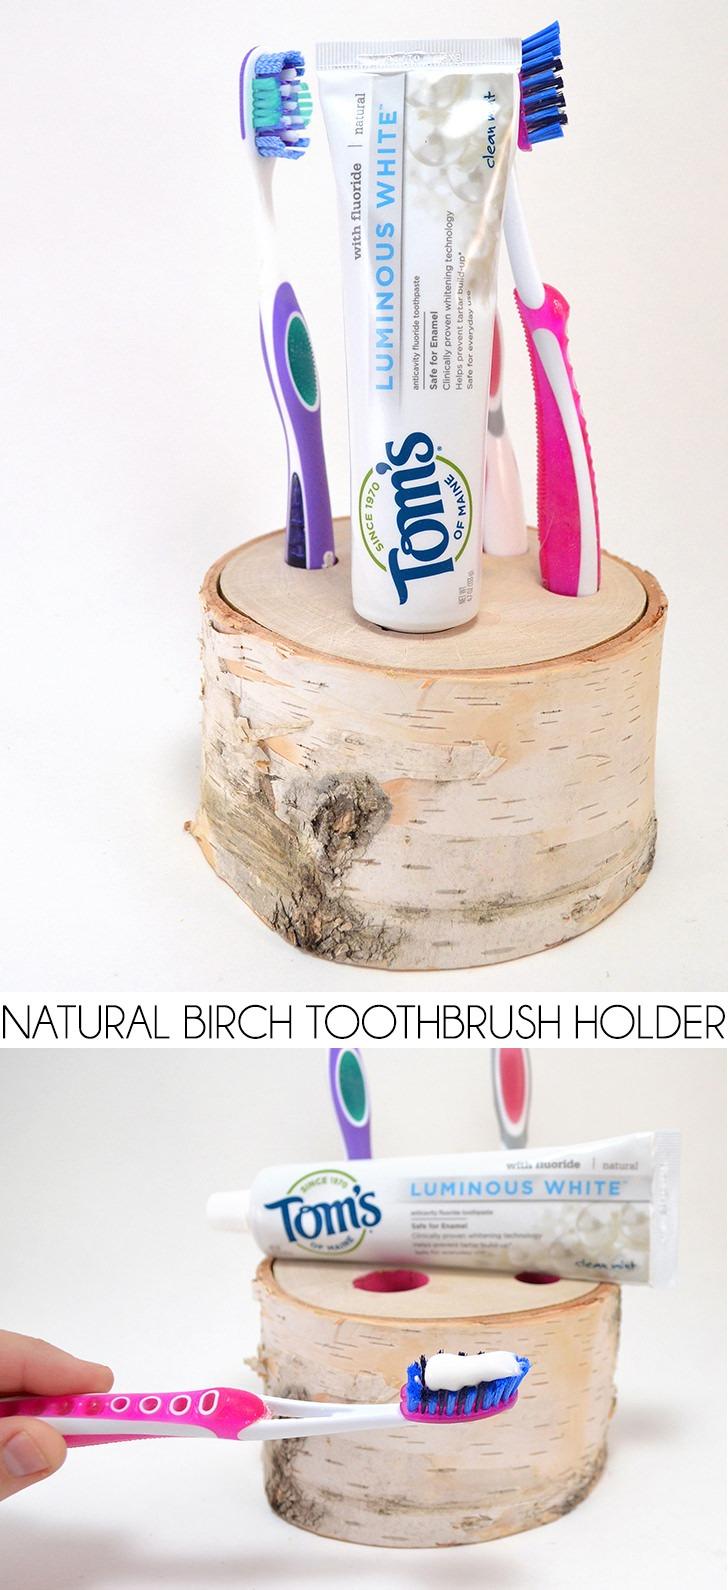 Natural Birch Toothbrush Holder Tutorial